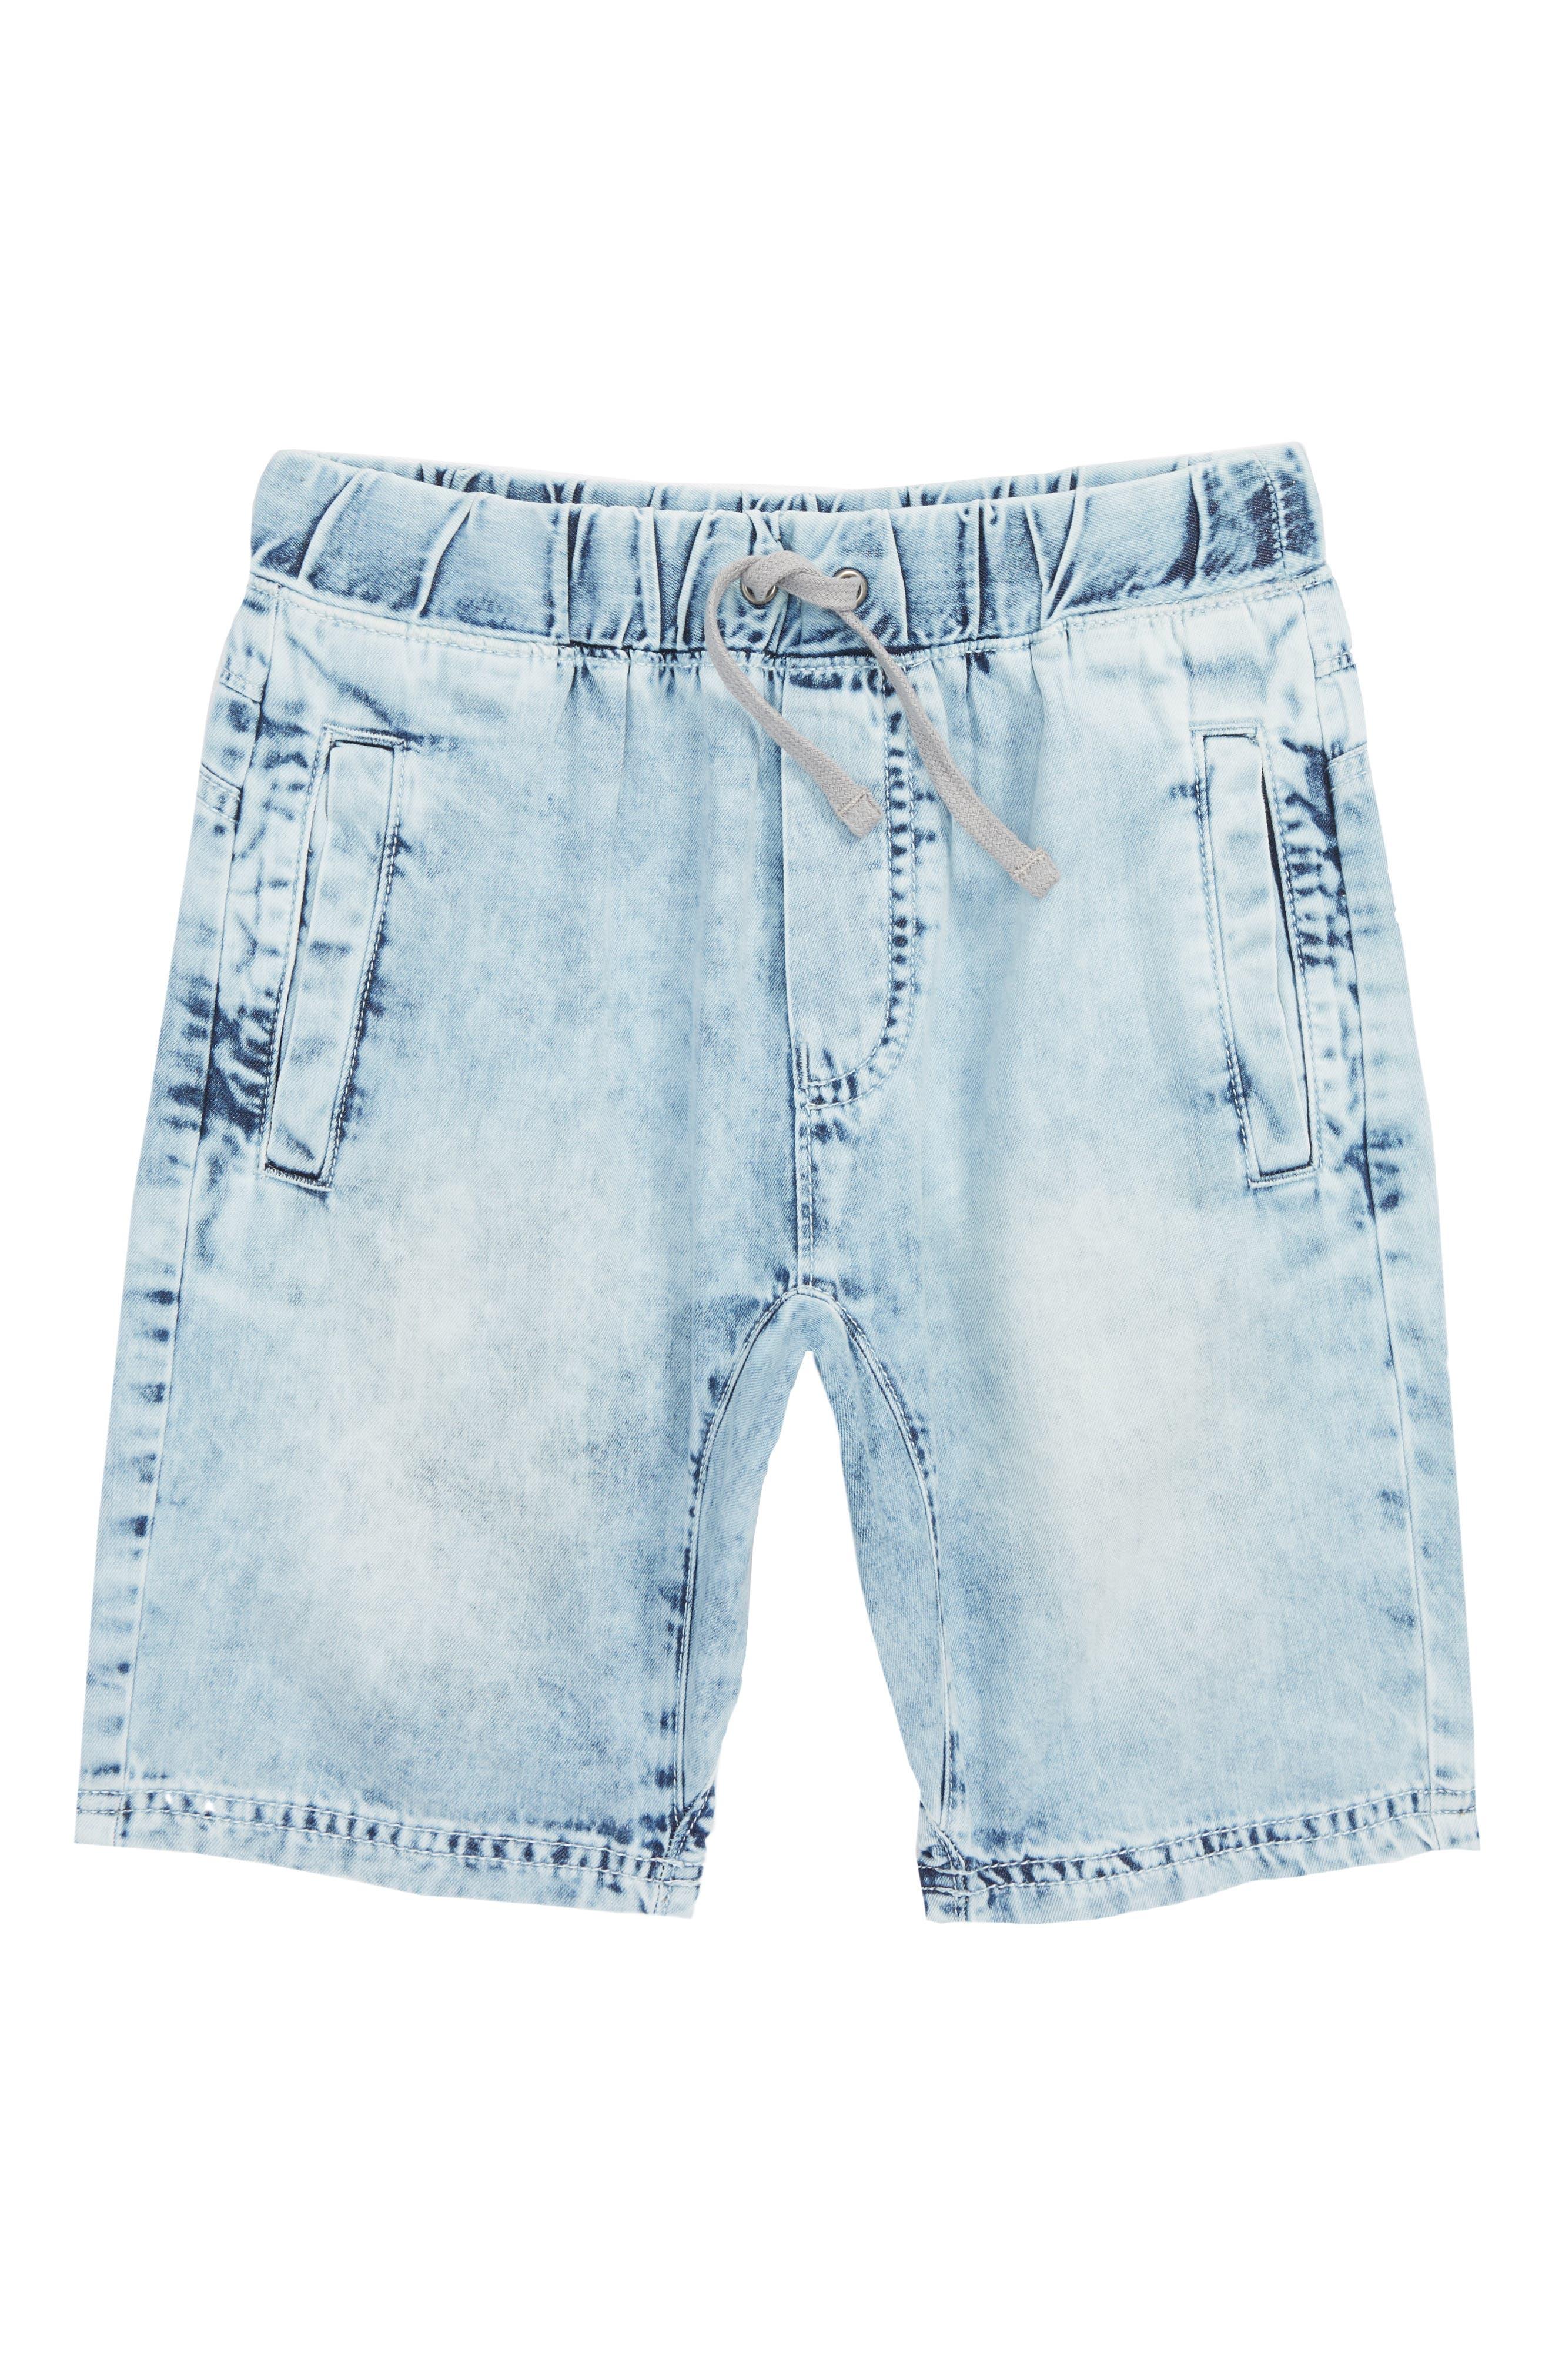 Denim Shorts,                         Main,                         color, 450